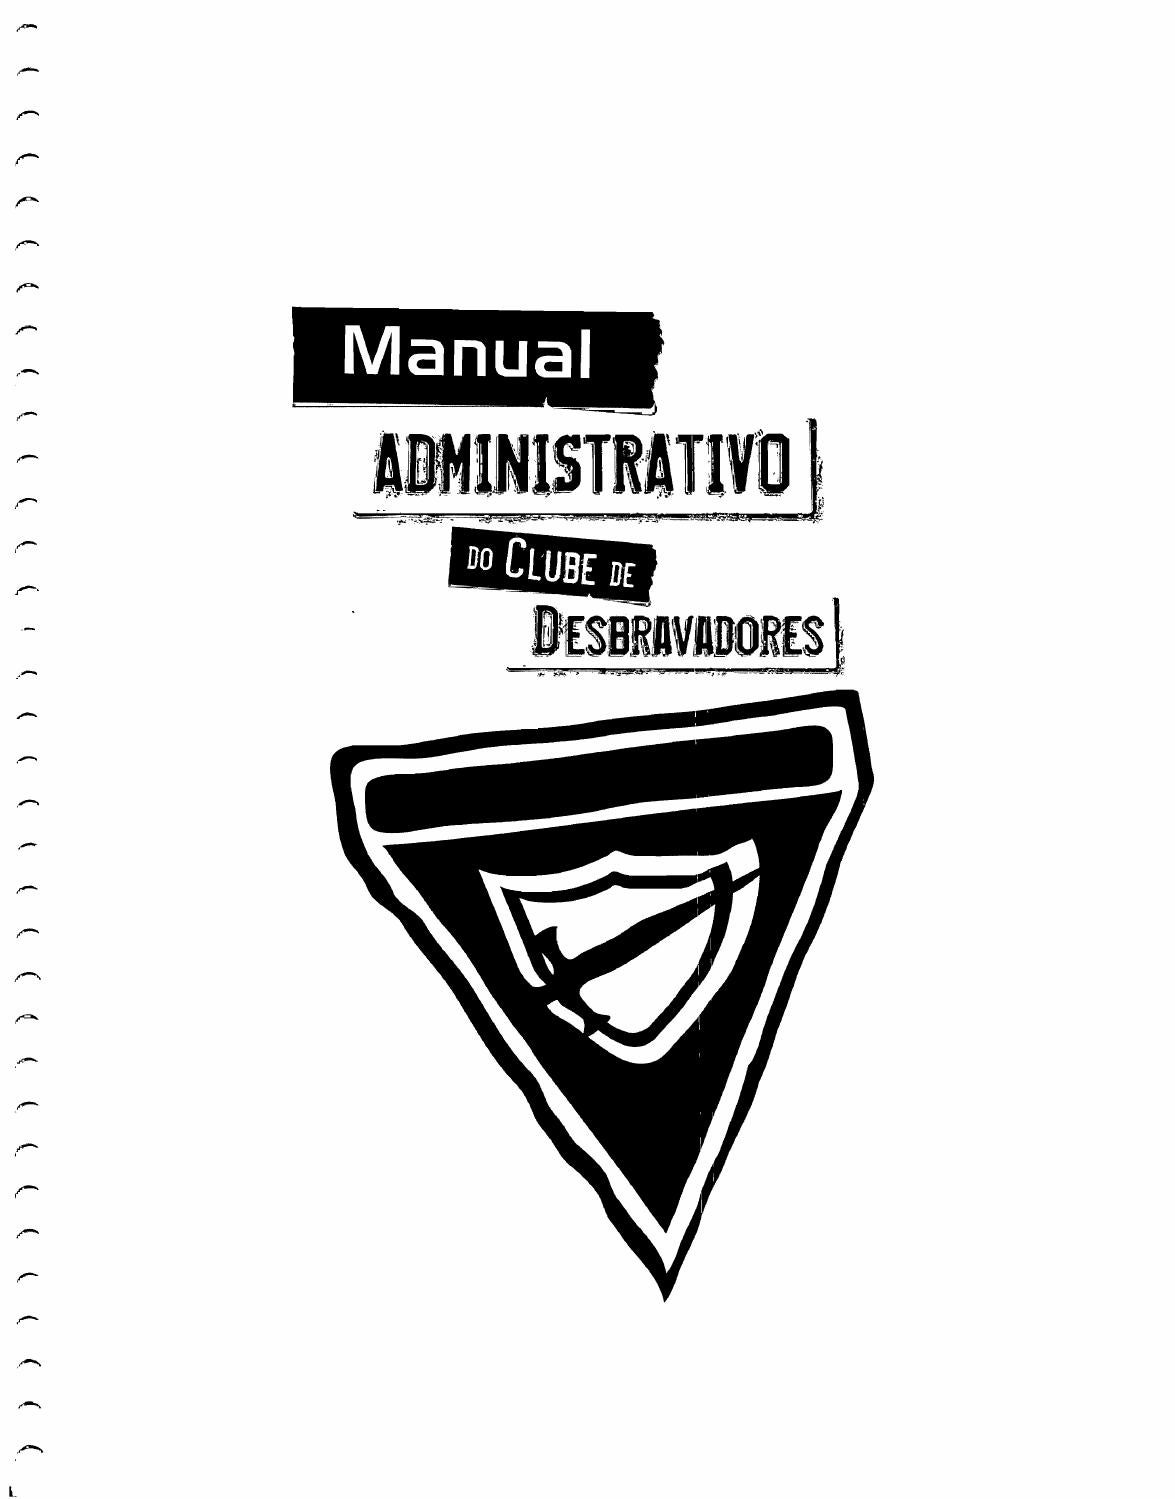 Novo manual administrativo de desbravadores dsa 2014 by